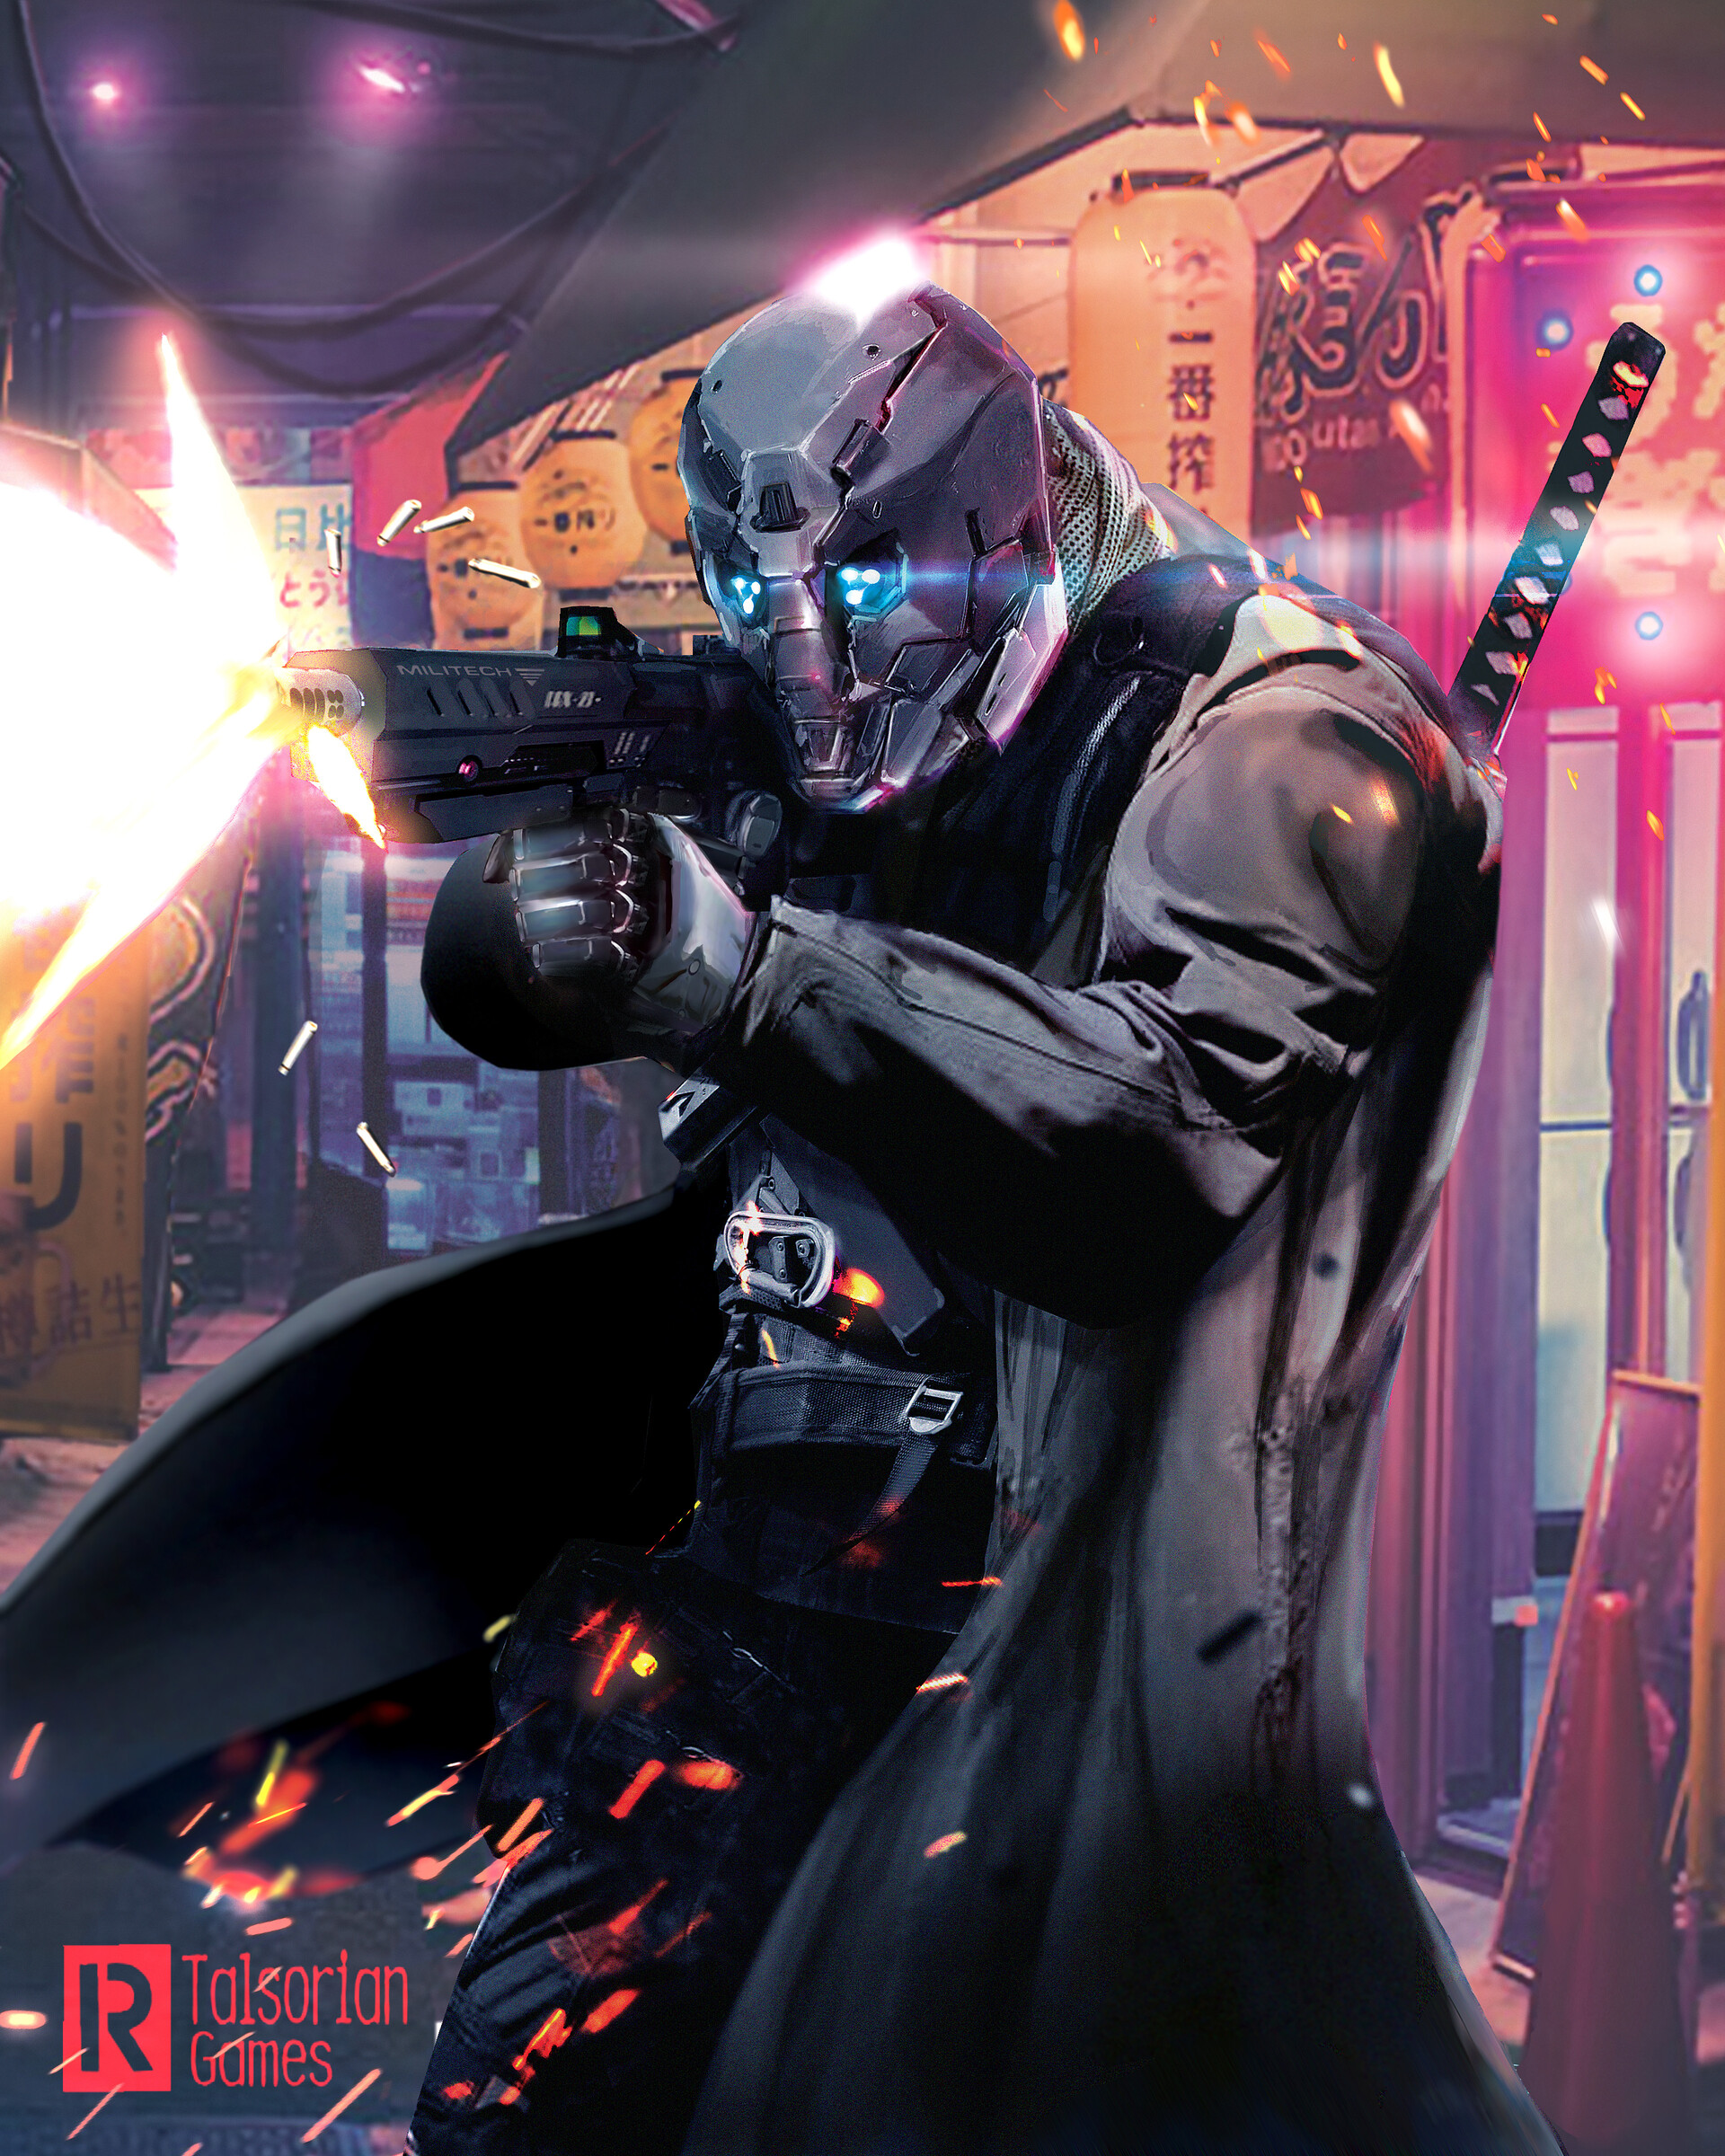 Cyberpunk RED Art